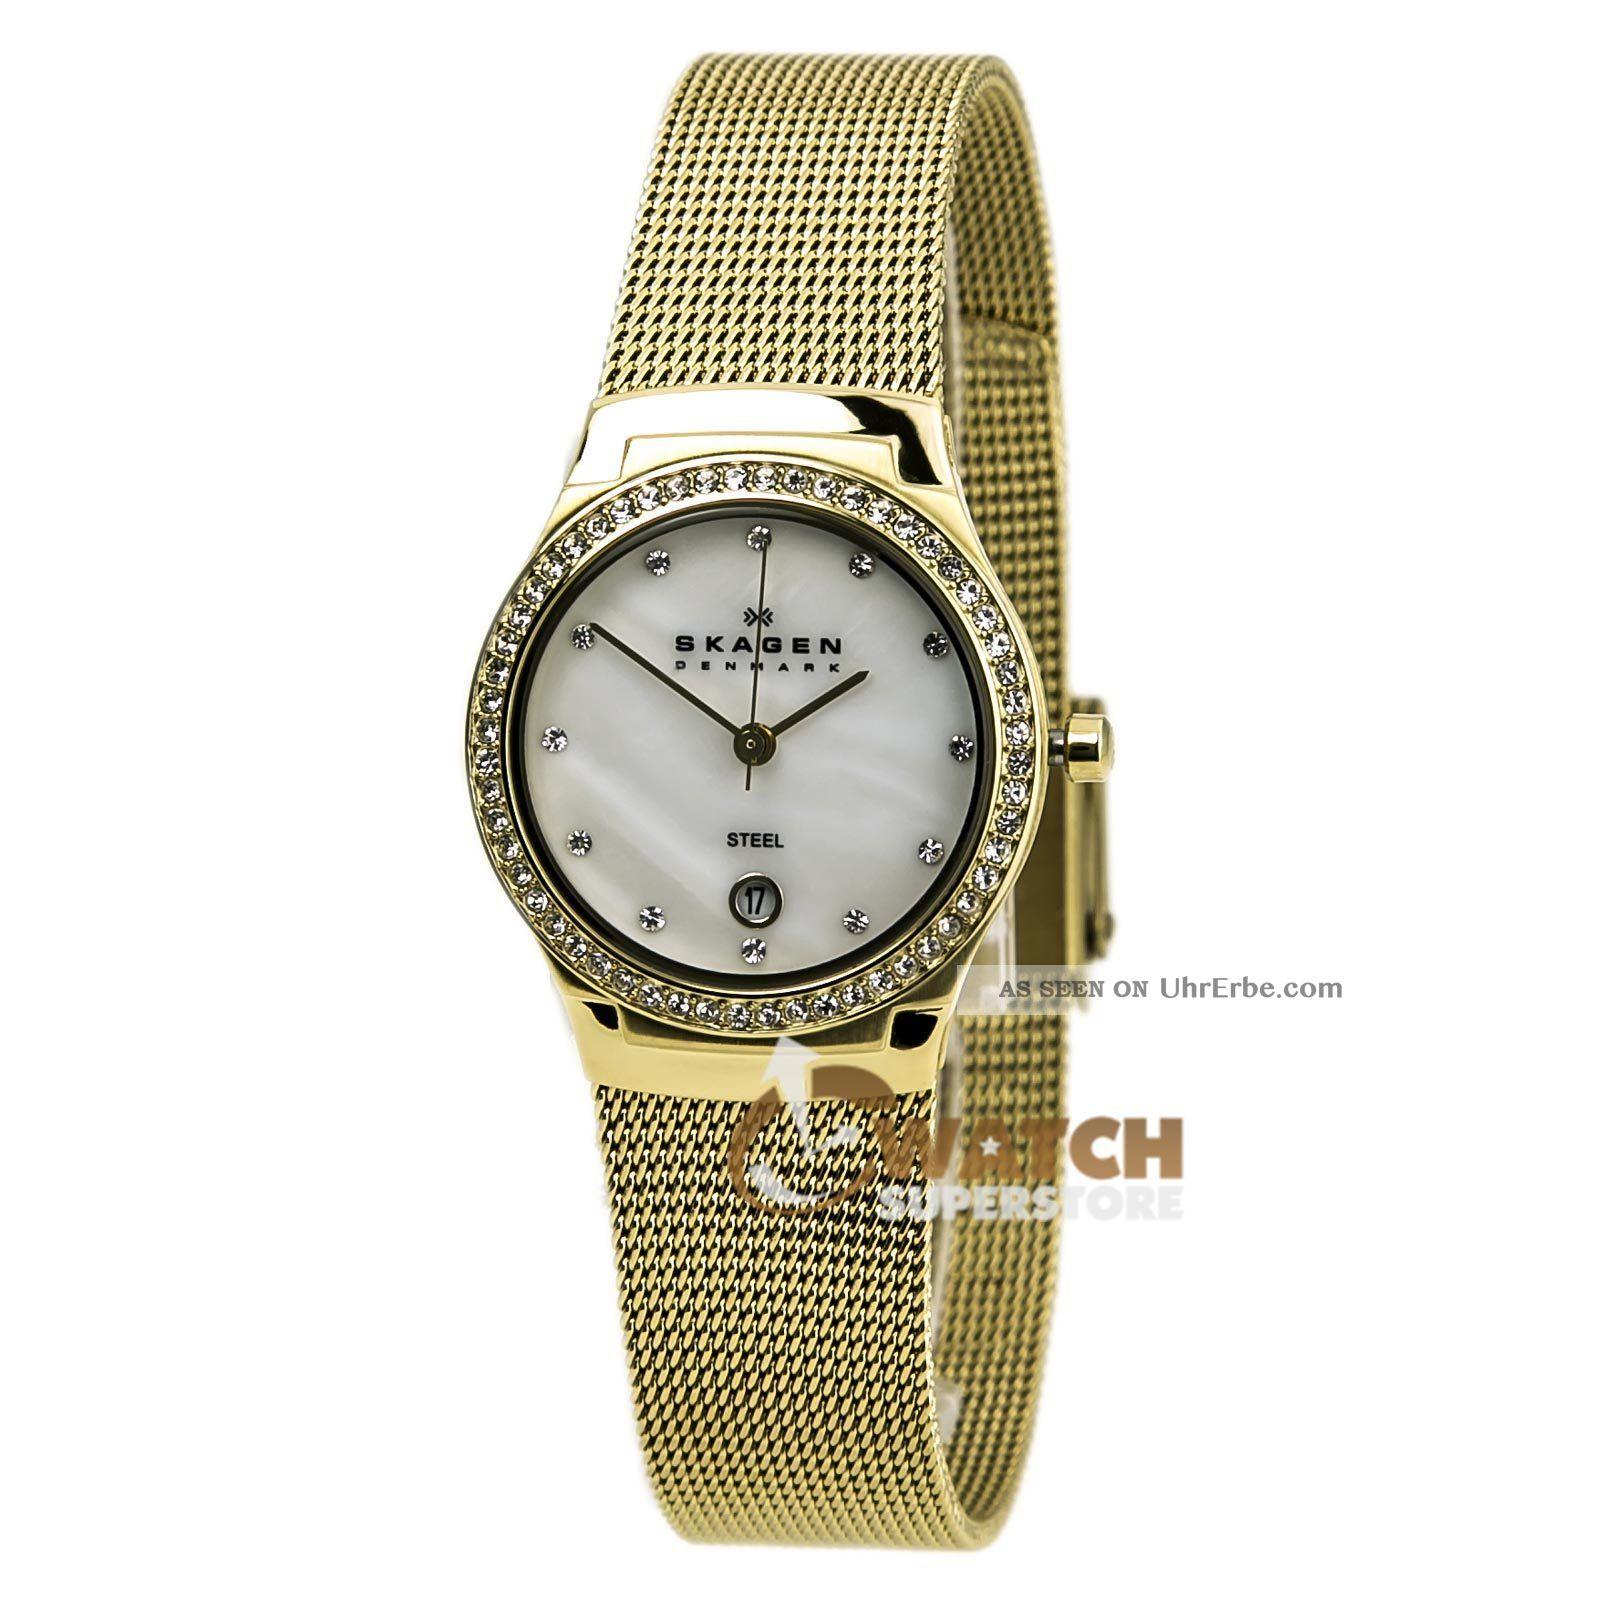 Skagen Skw2040 Damen Dänemark Kris.  Mop Gold Zifferblatt &stahlgitter Armbanduhr Armbanduhren Bild